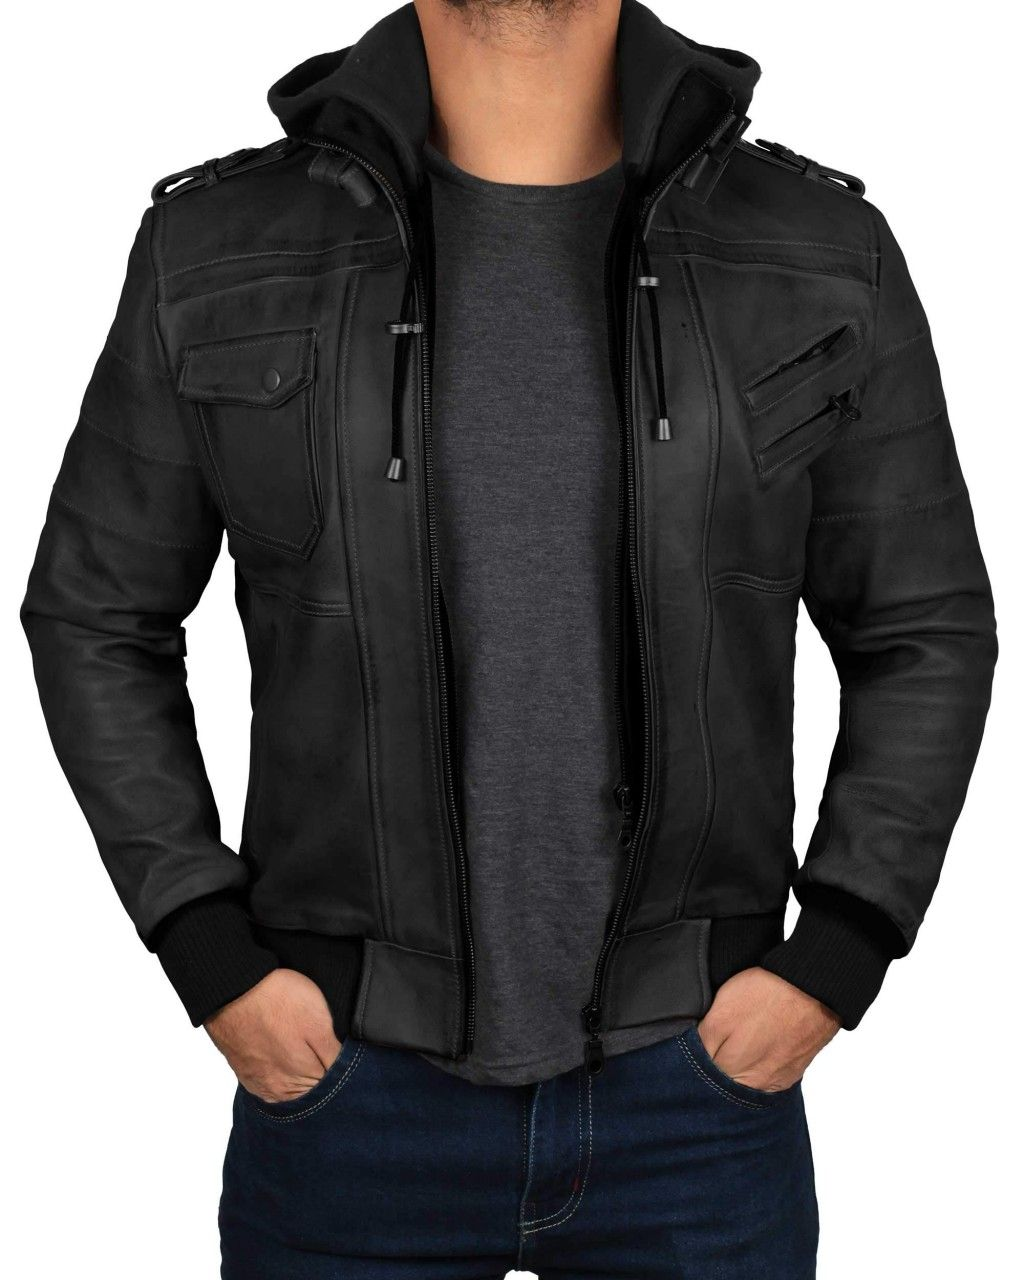 Edinburgh Black Hooded Leather Jacket Leather Jacket With Hood Leather Bomber Jacket Black Leather Jacket Men [ 1280 x 1024 Pixel ]